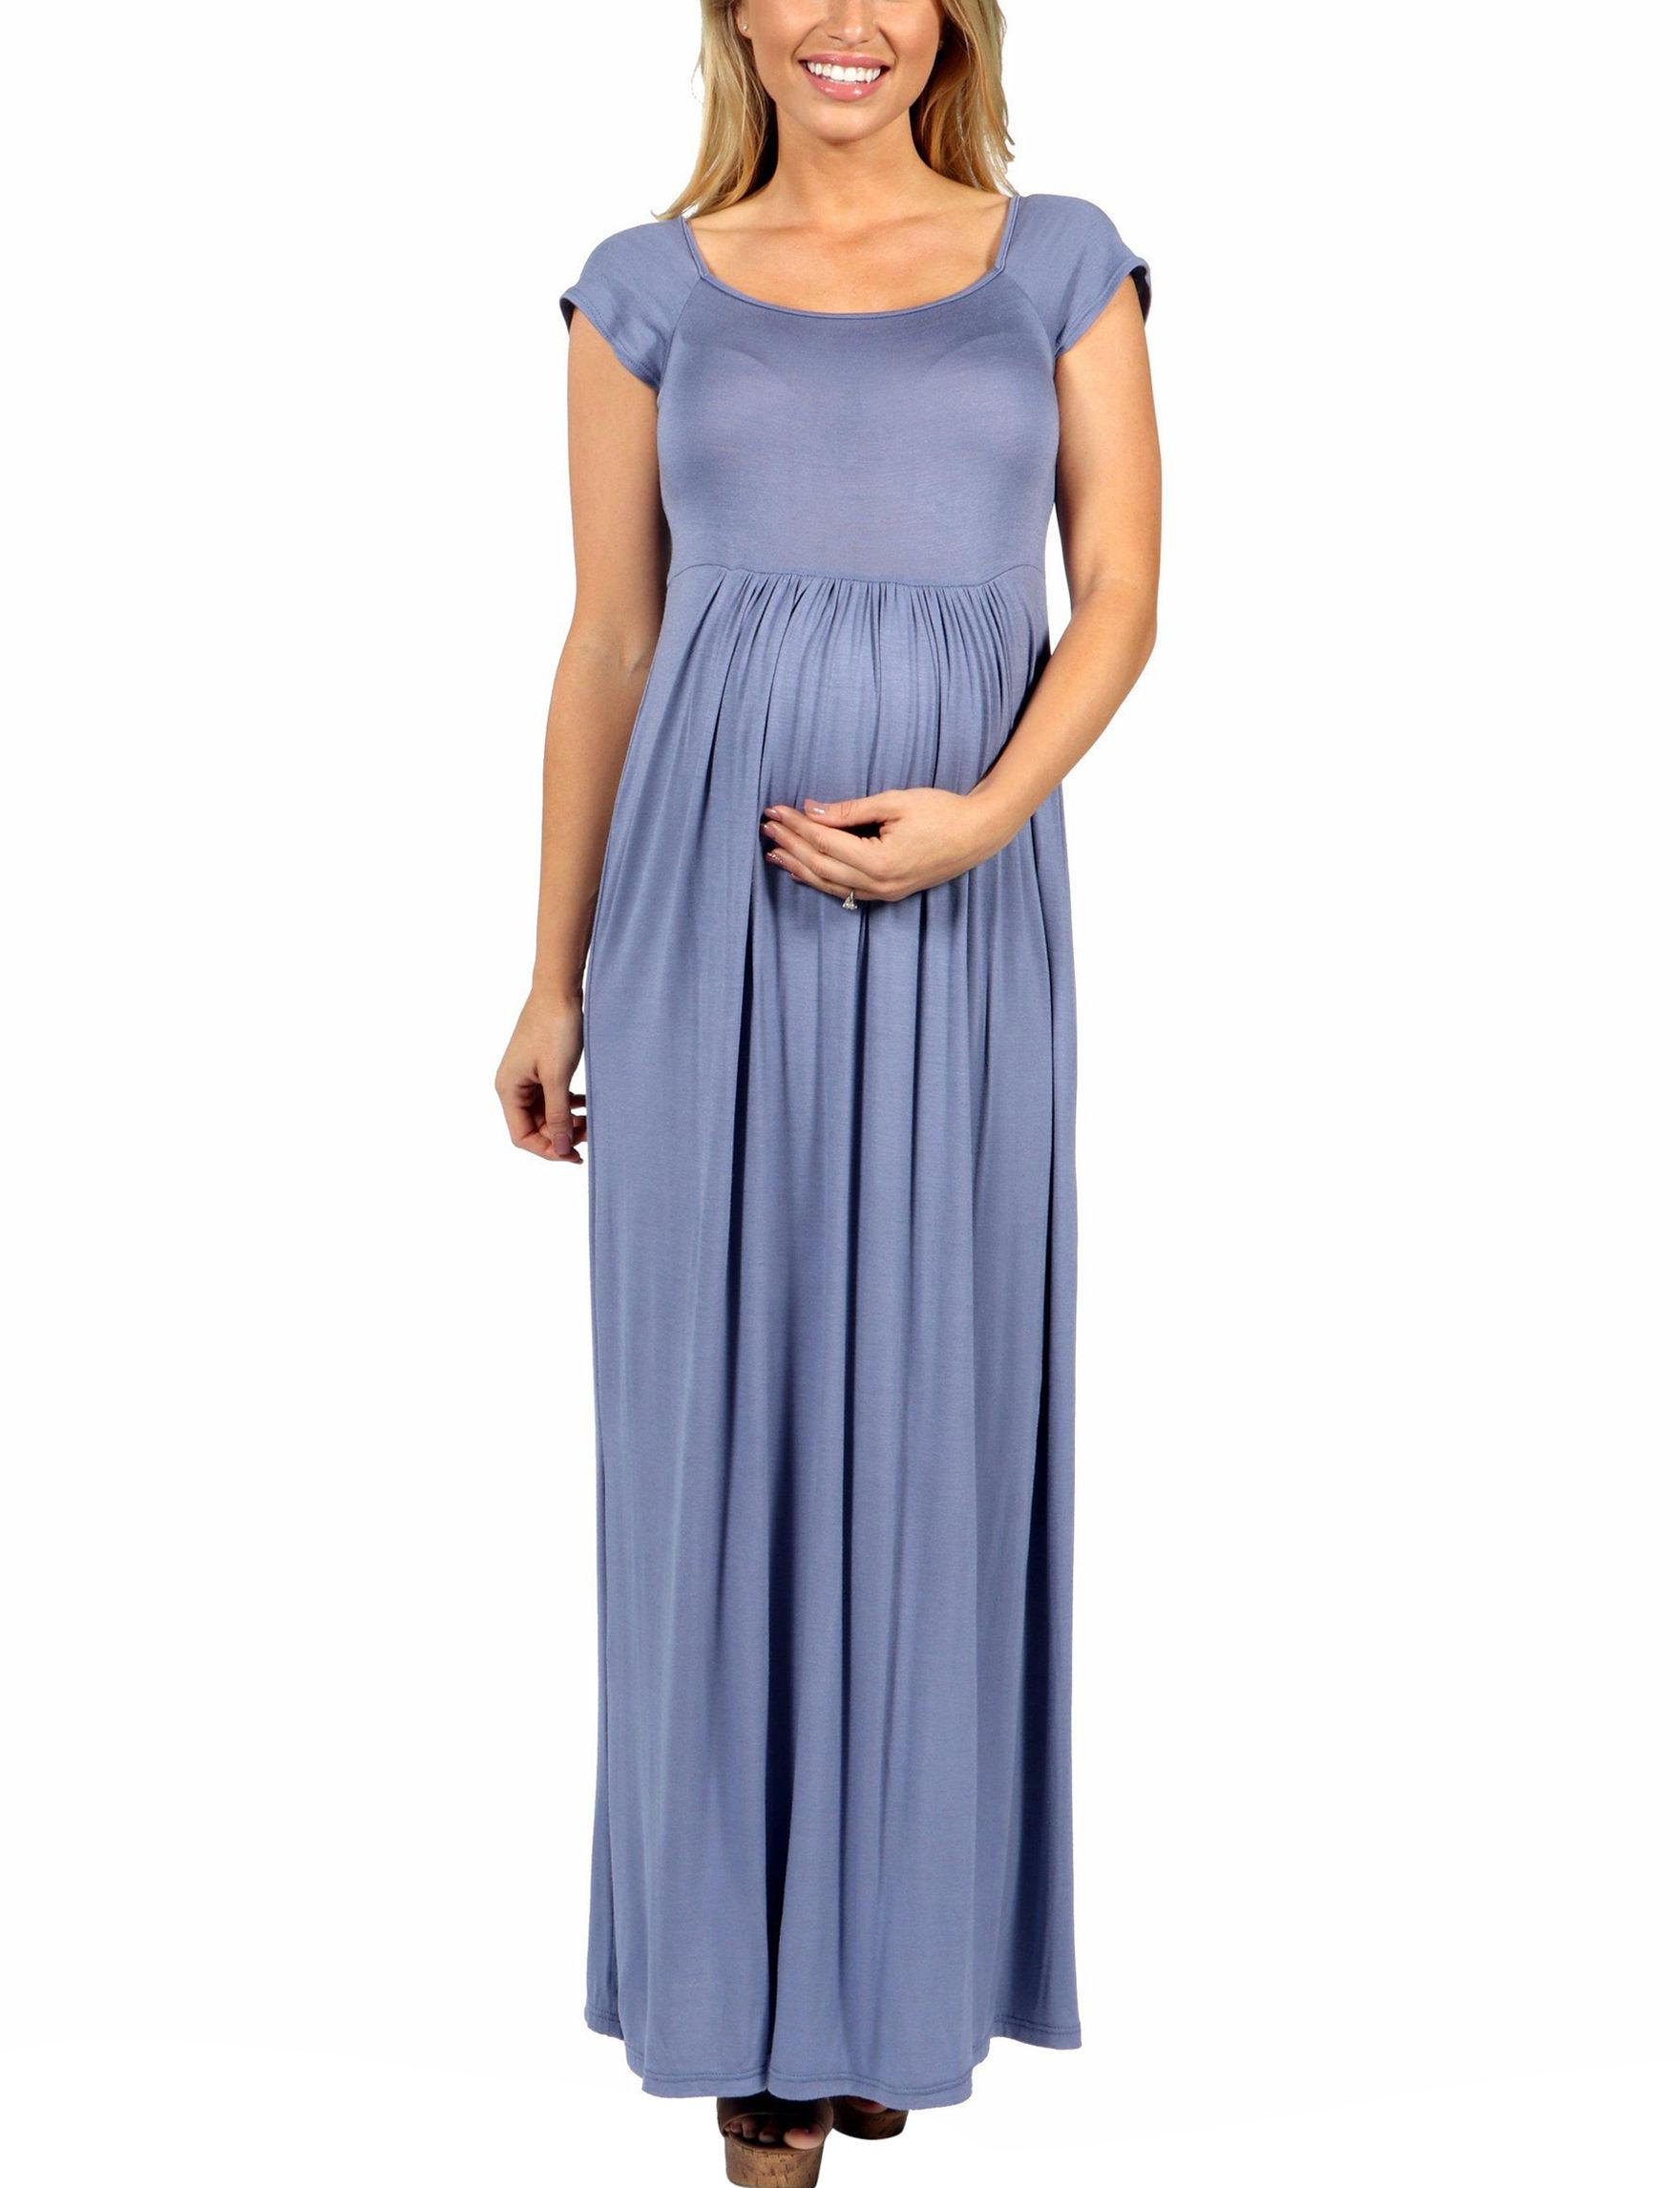 d6da58fd4a54 24Seven Comfort Apparel Maternity Empire Waist Maxi Dress | Stage ...